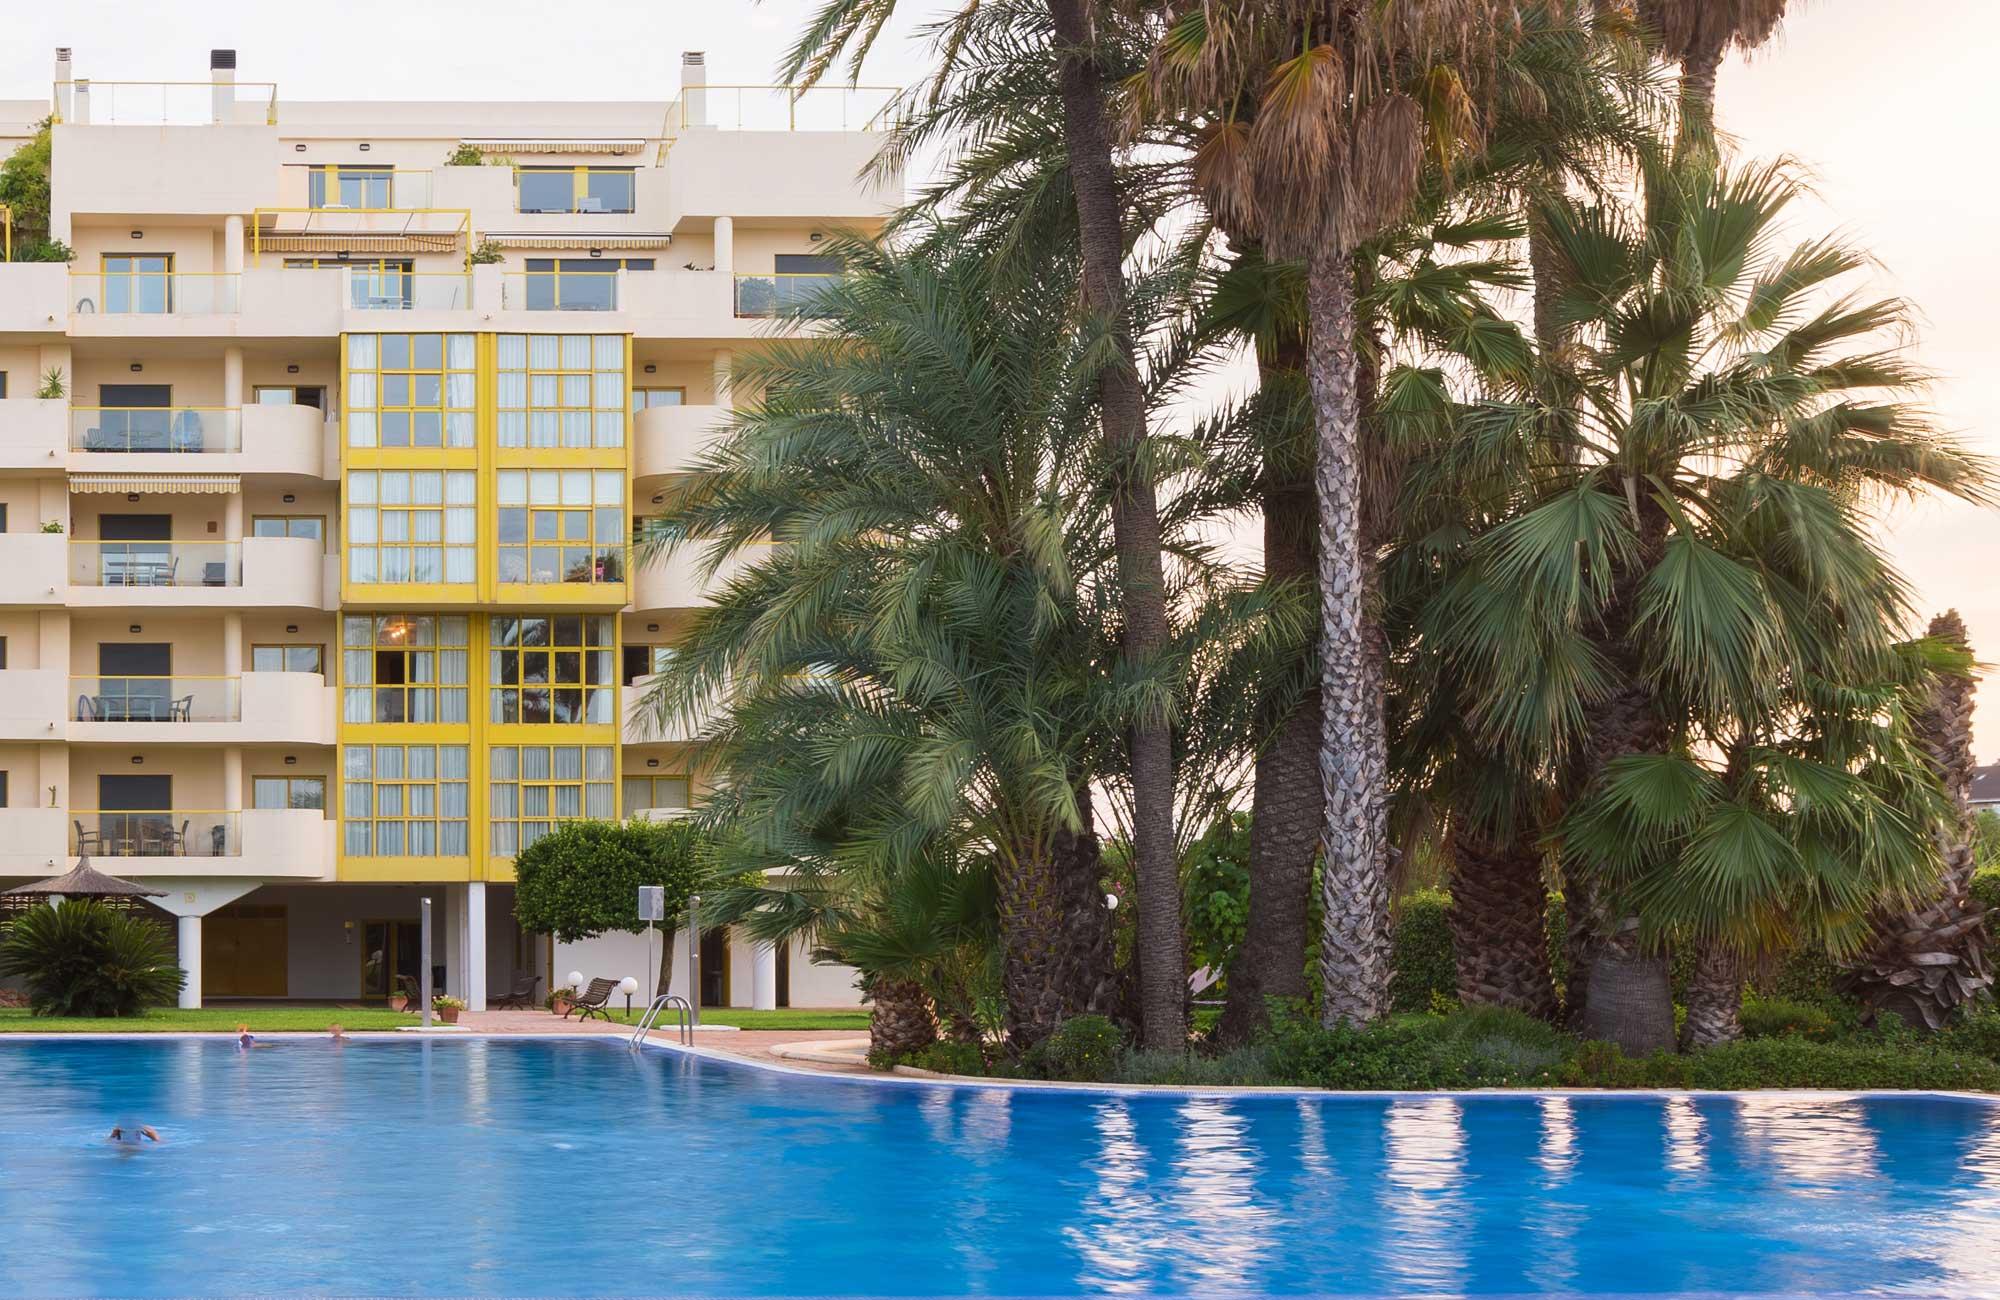 Proyecto Lagos del Castillo - RZS Real Estate - Promociones RZS